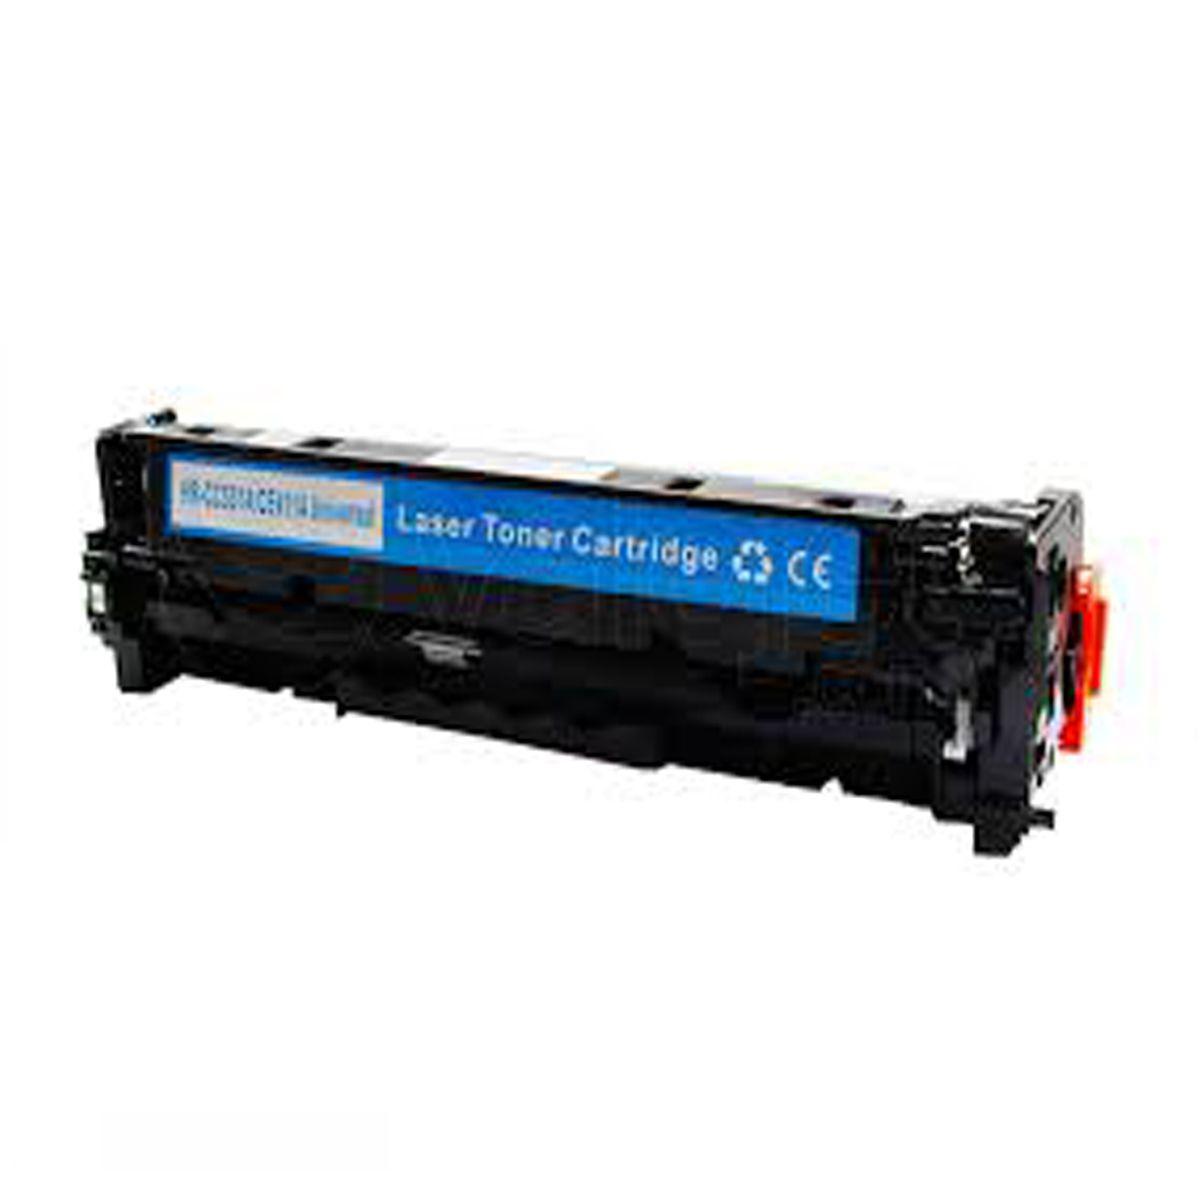 Toner CE411A CE-411A 411A 411 305A Ciano - M451DW M451DN M451NW M475DW M375NW